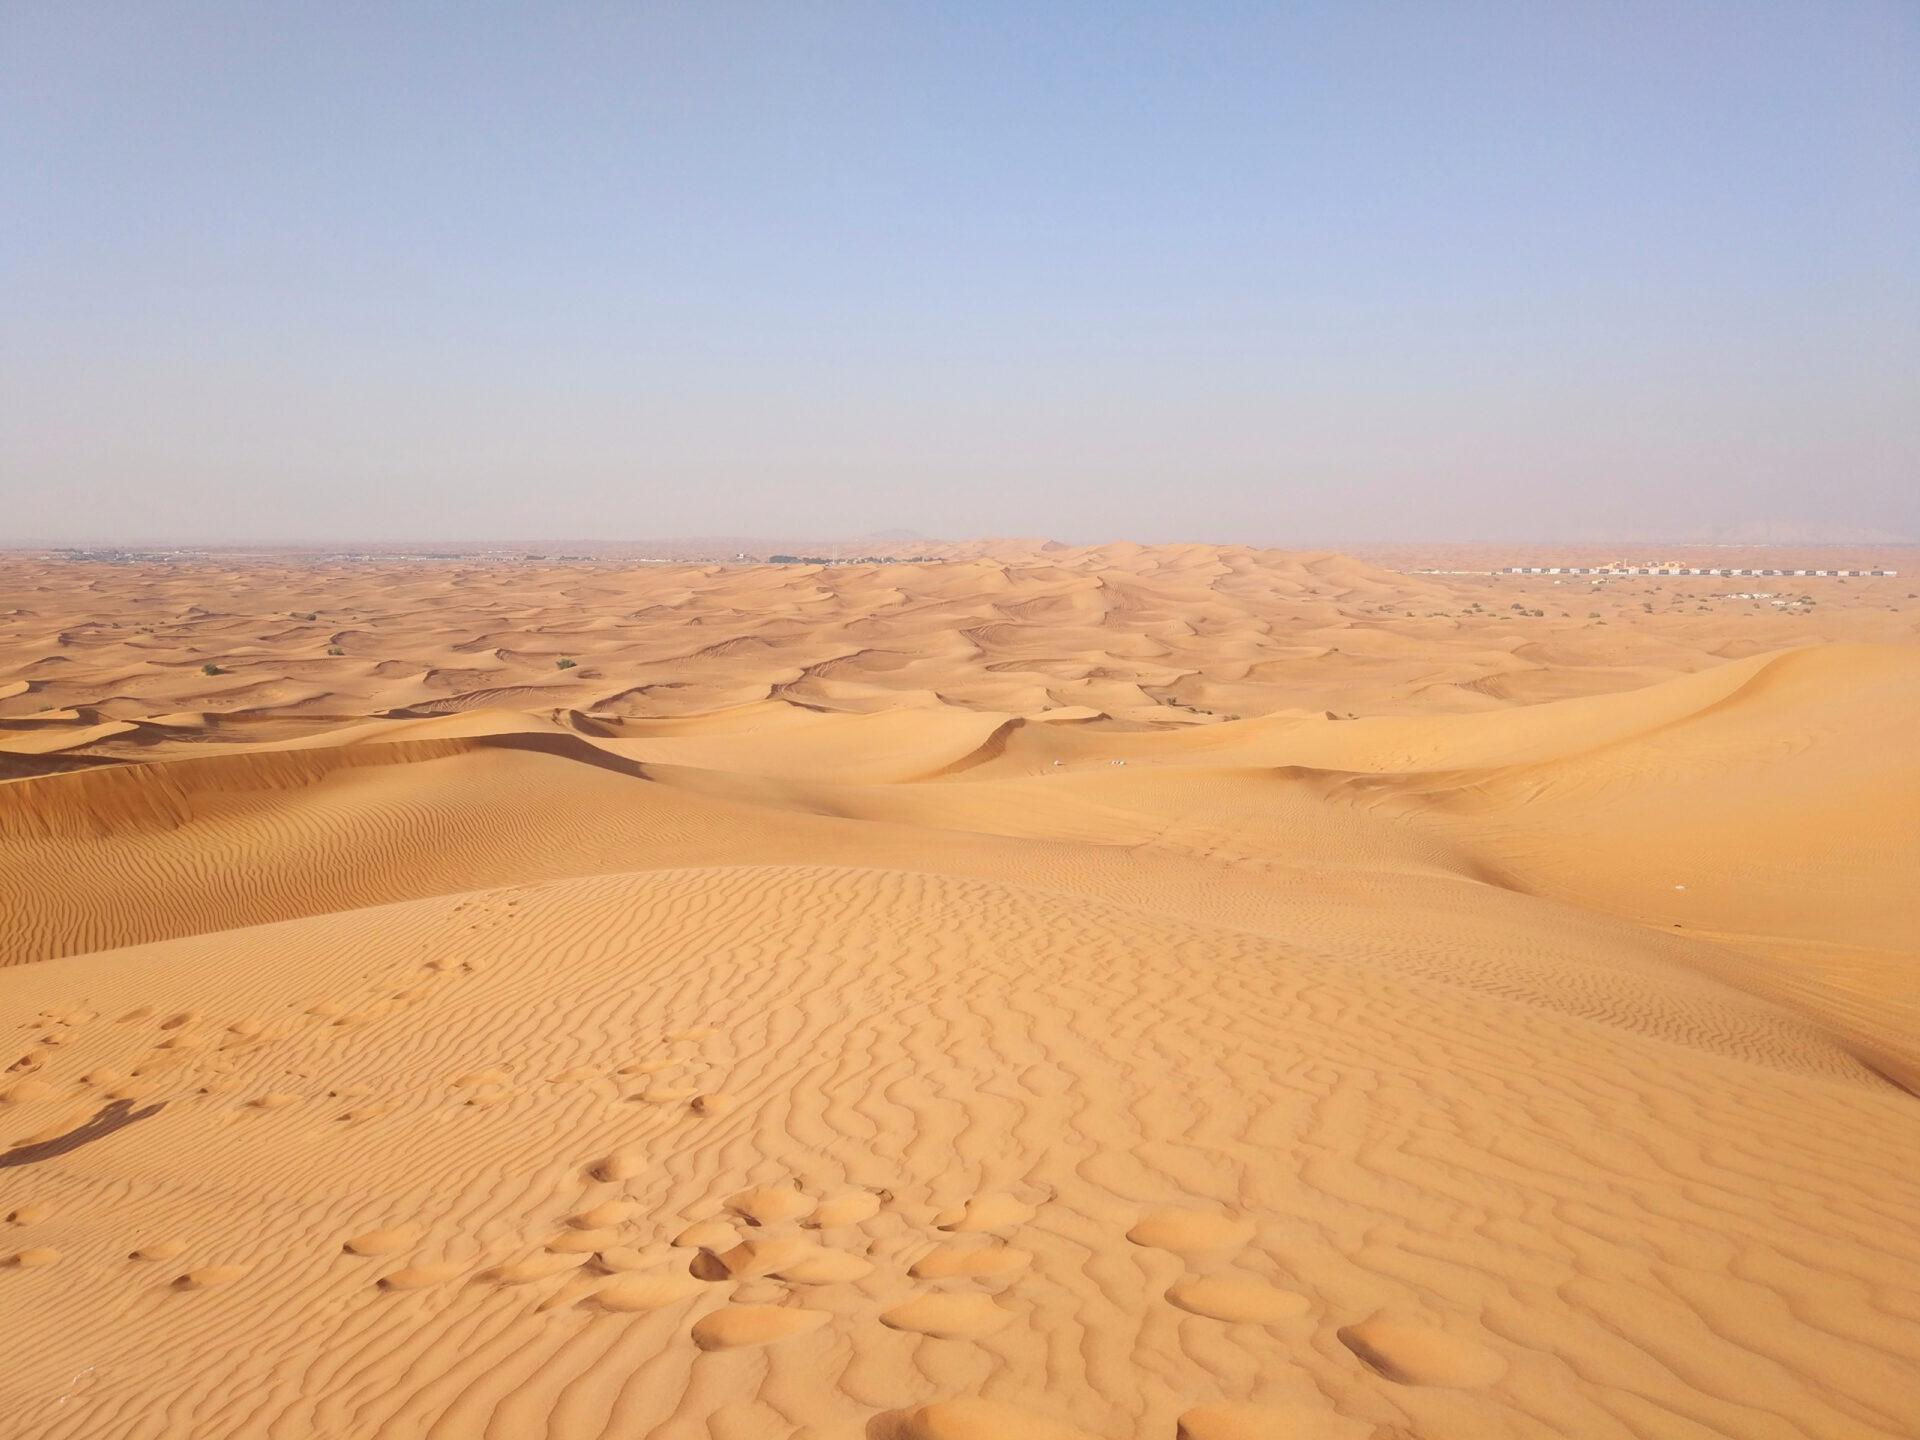 Пустыня Сахара… джип пинг… А _А-ааааааааааааа…